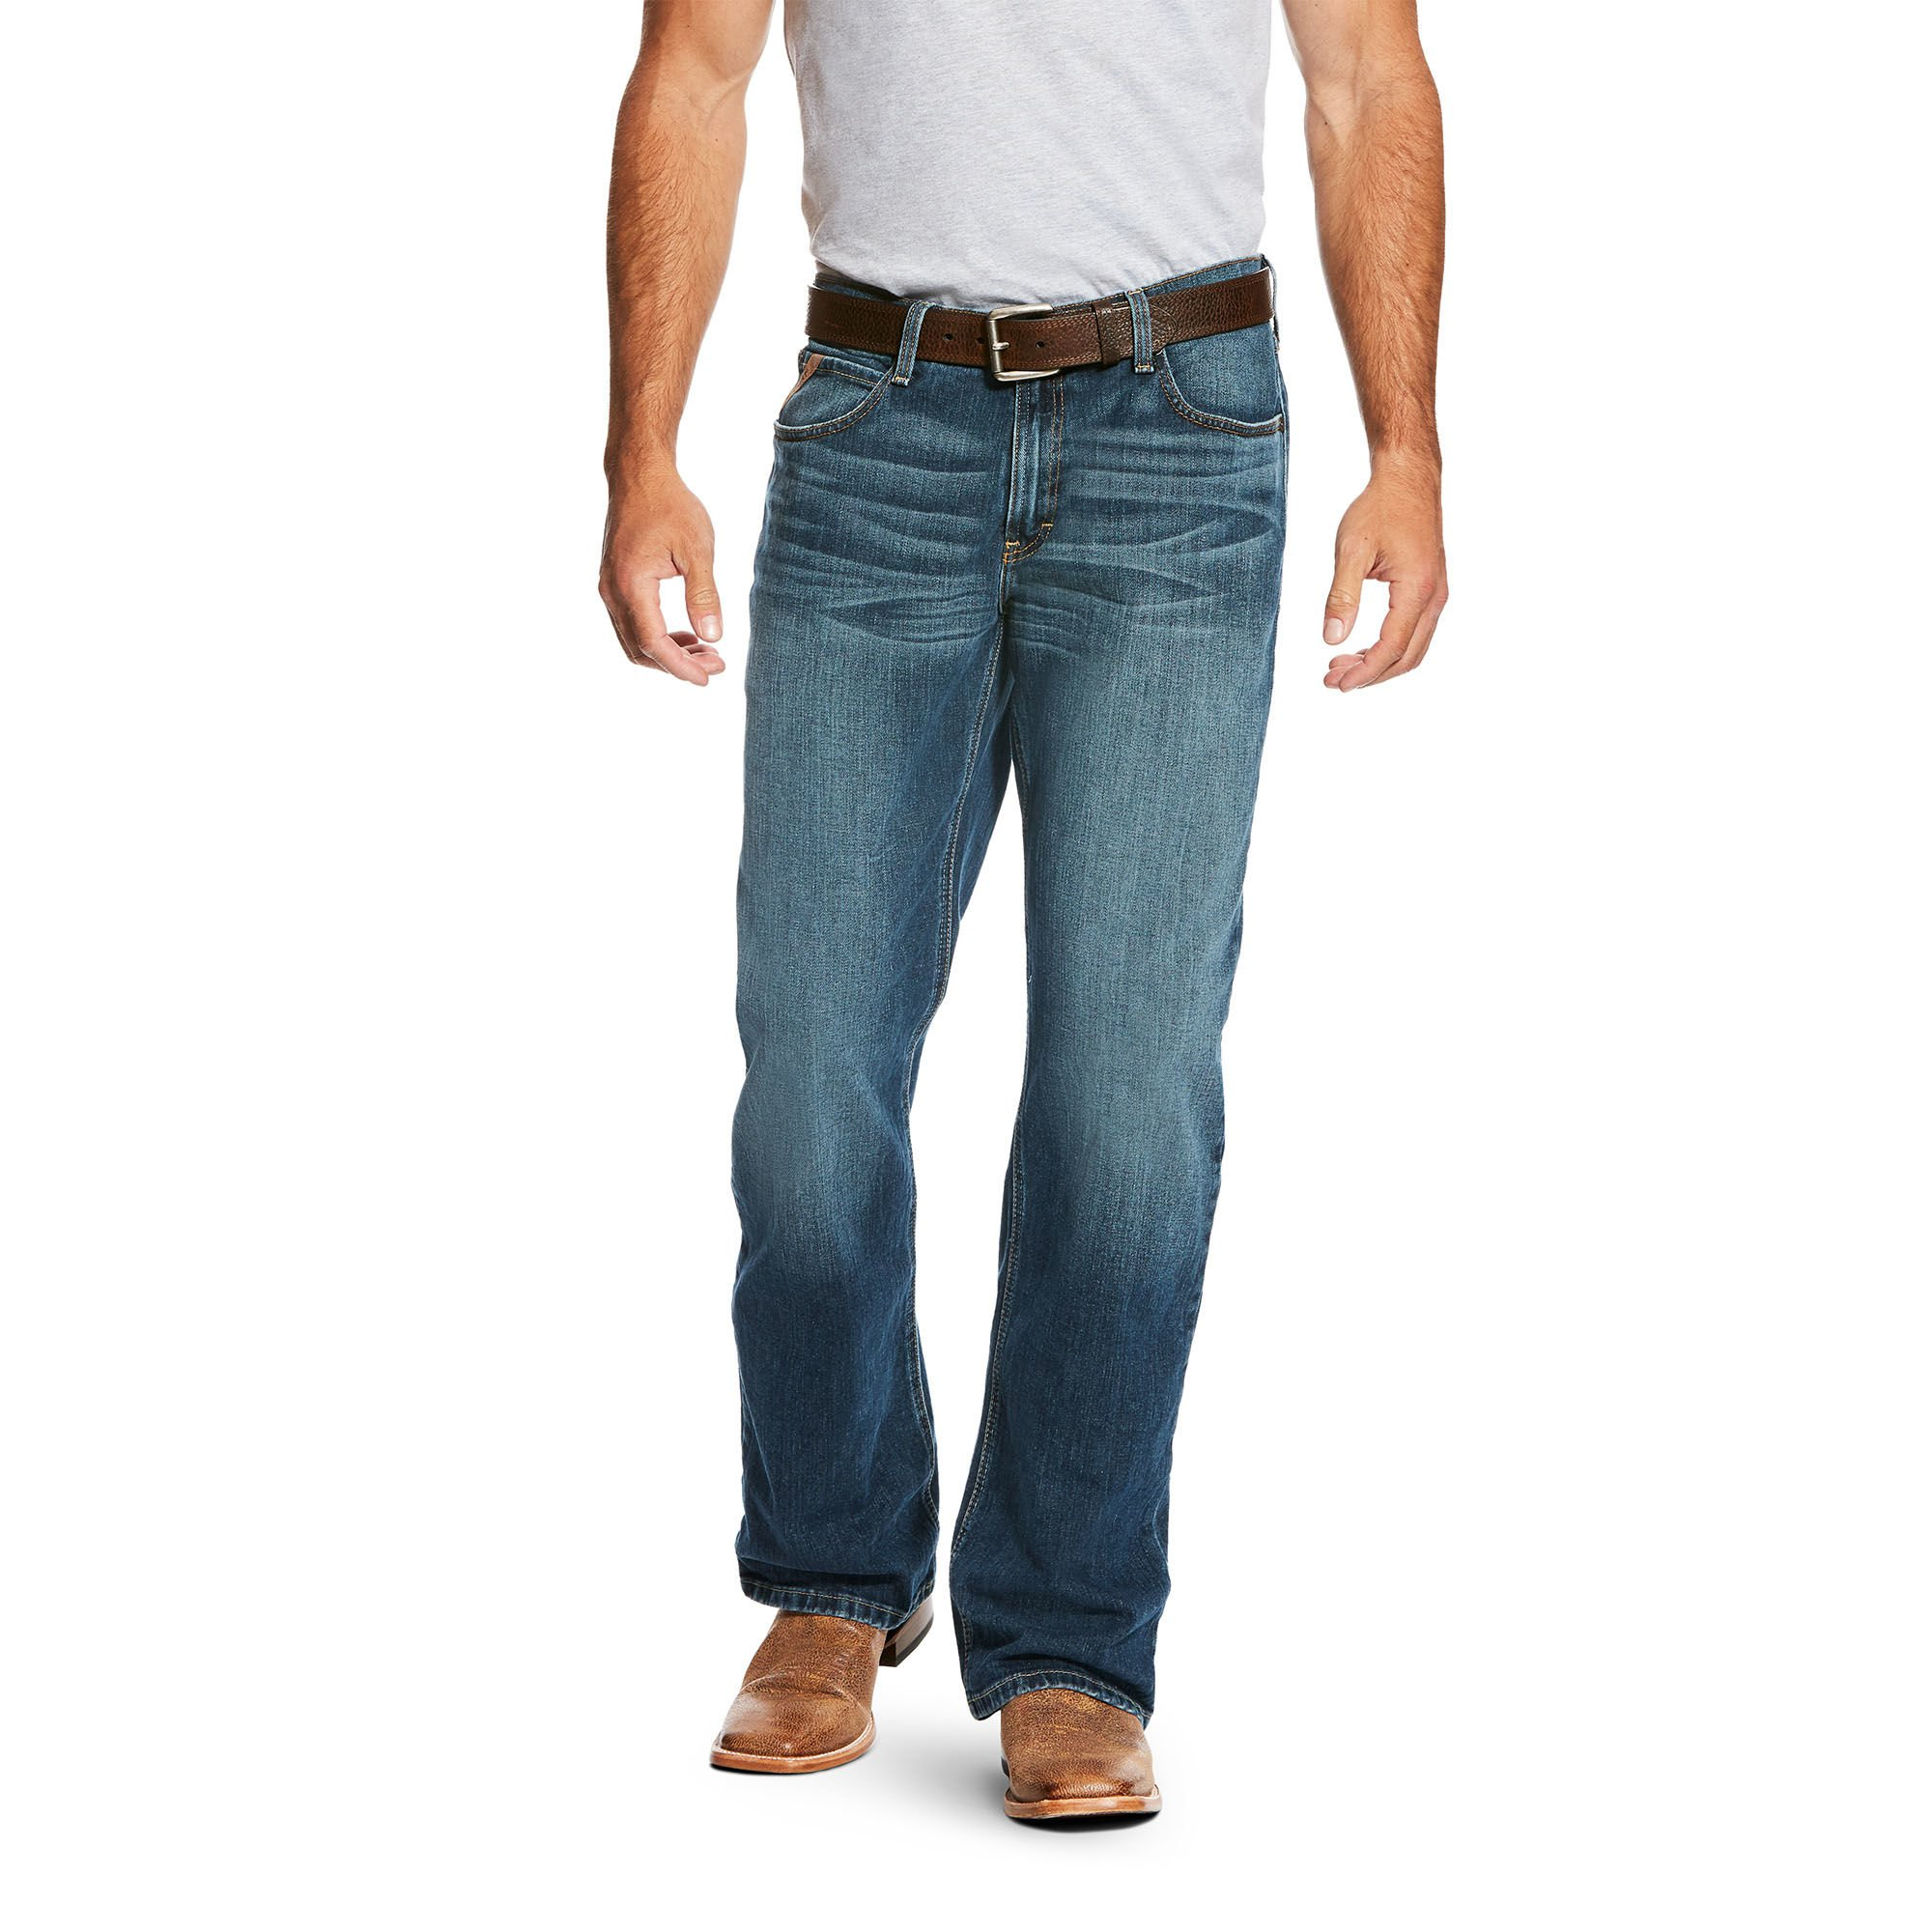 Ariat Men's M4 Low Rise Boot Cut Jean, Stretch Kiroy, 36X30